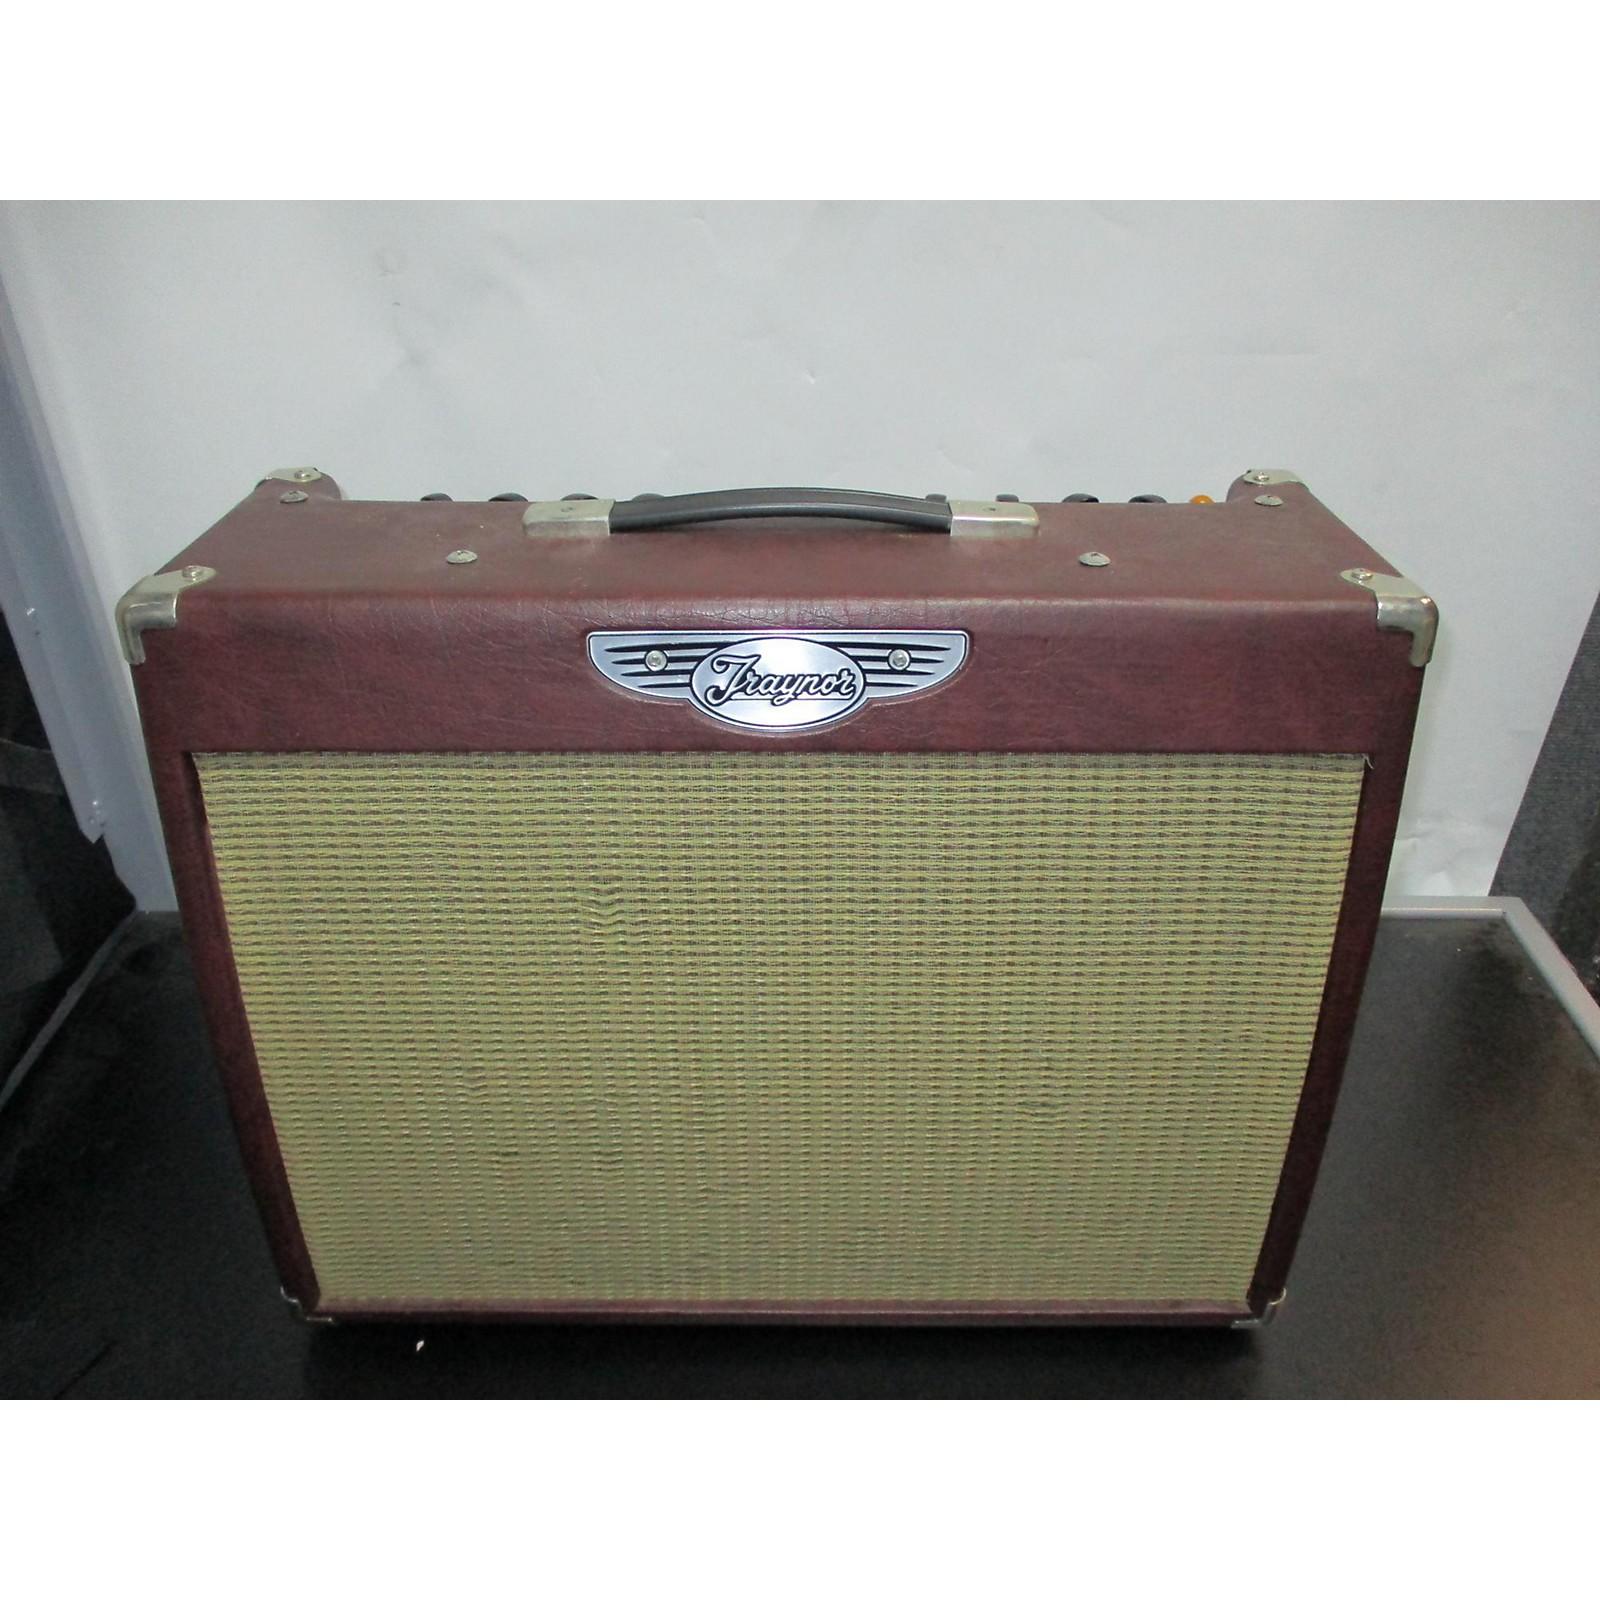 Traynor Ycv40r Tube Guitar Combo Amp